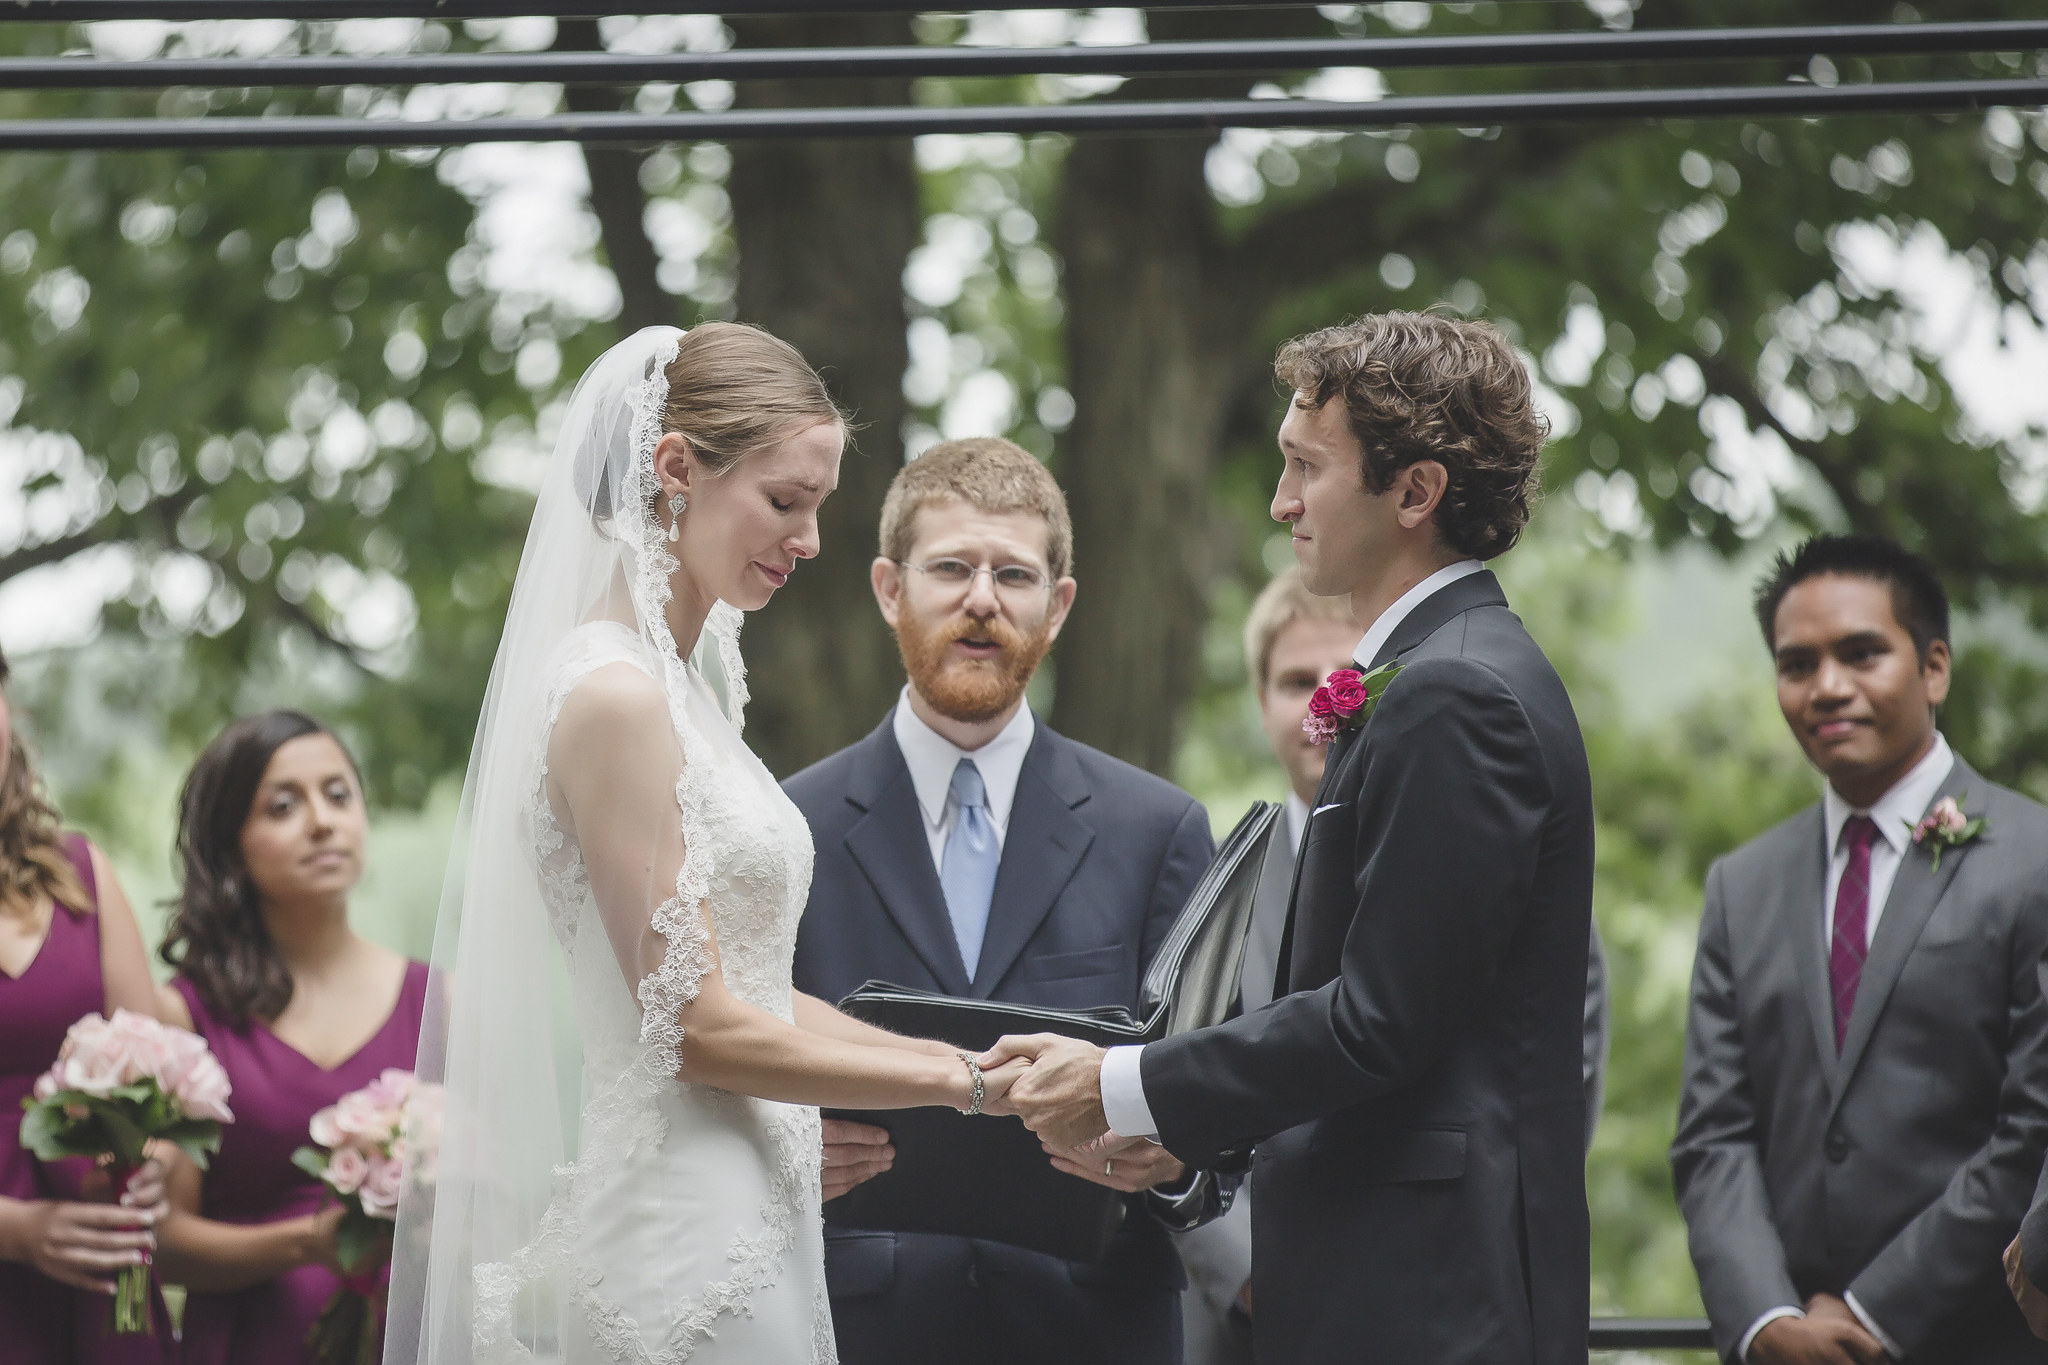 james j hill library wedding photography-15.jpg